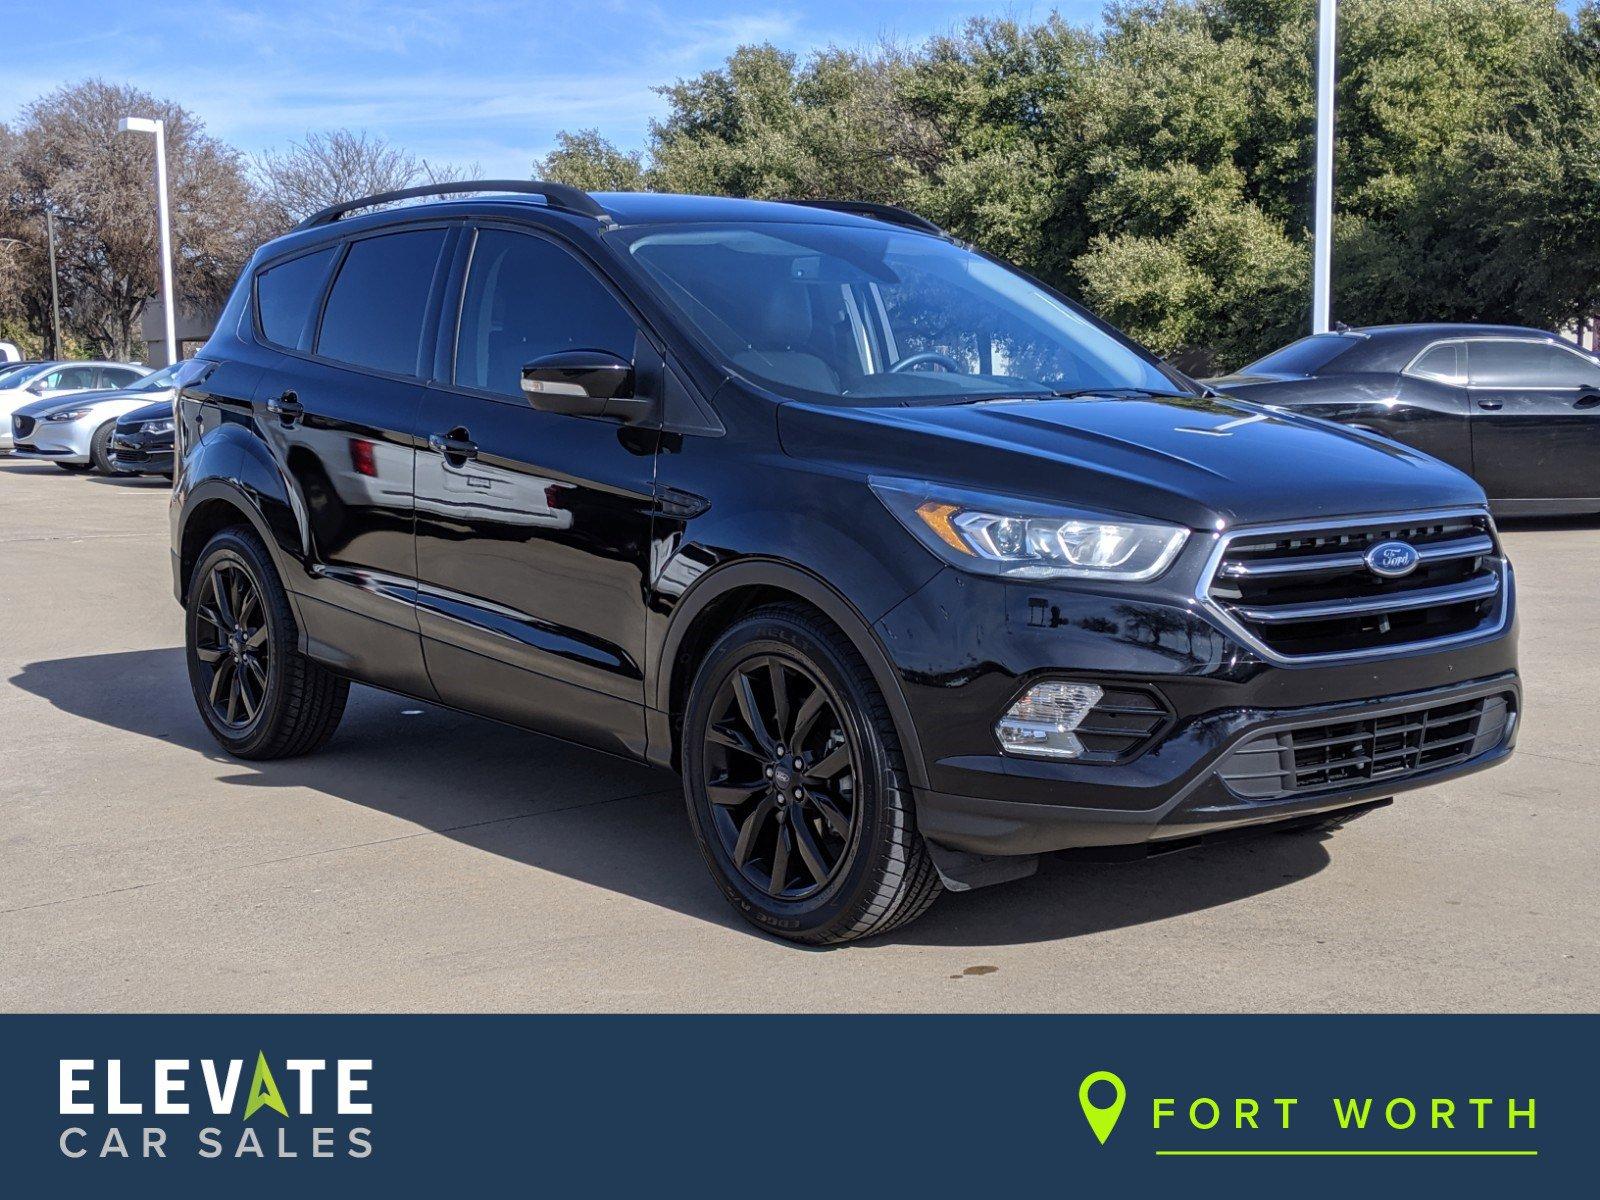 2017 Ford Escape FWD Titanium image